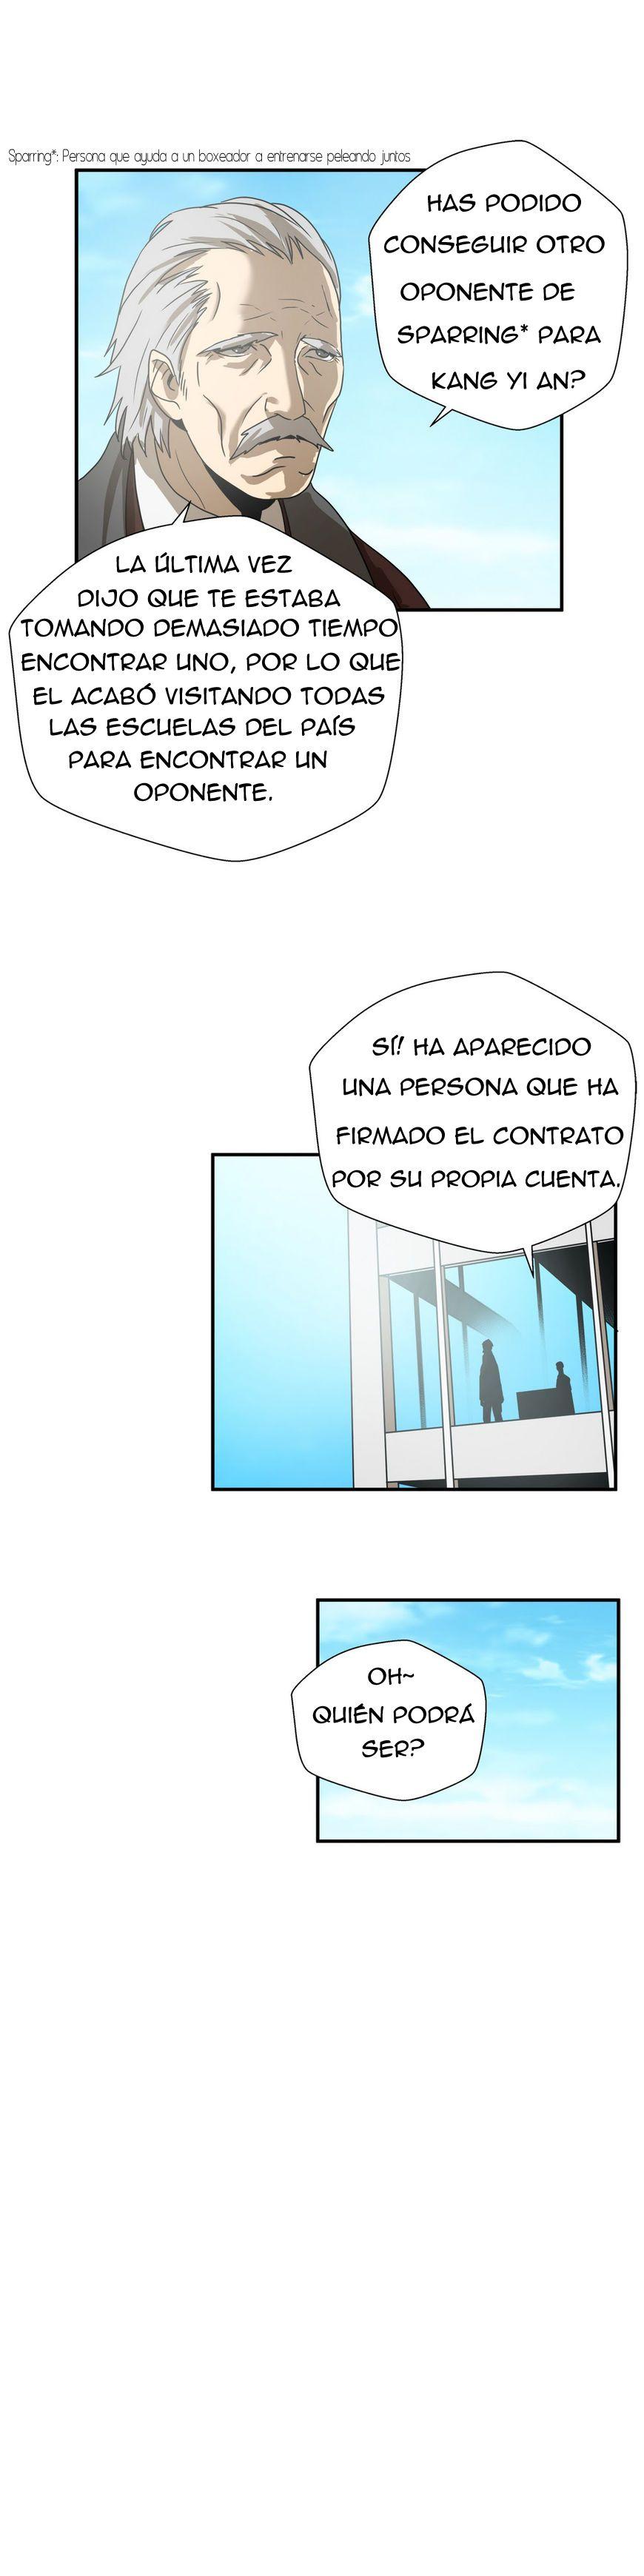 https://c5.ninemanga.com/es_manga/58/19386/461841/7a06b2d65f820cf687a432ab3126f804.jpg Page 9